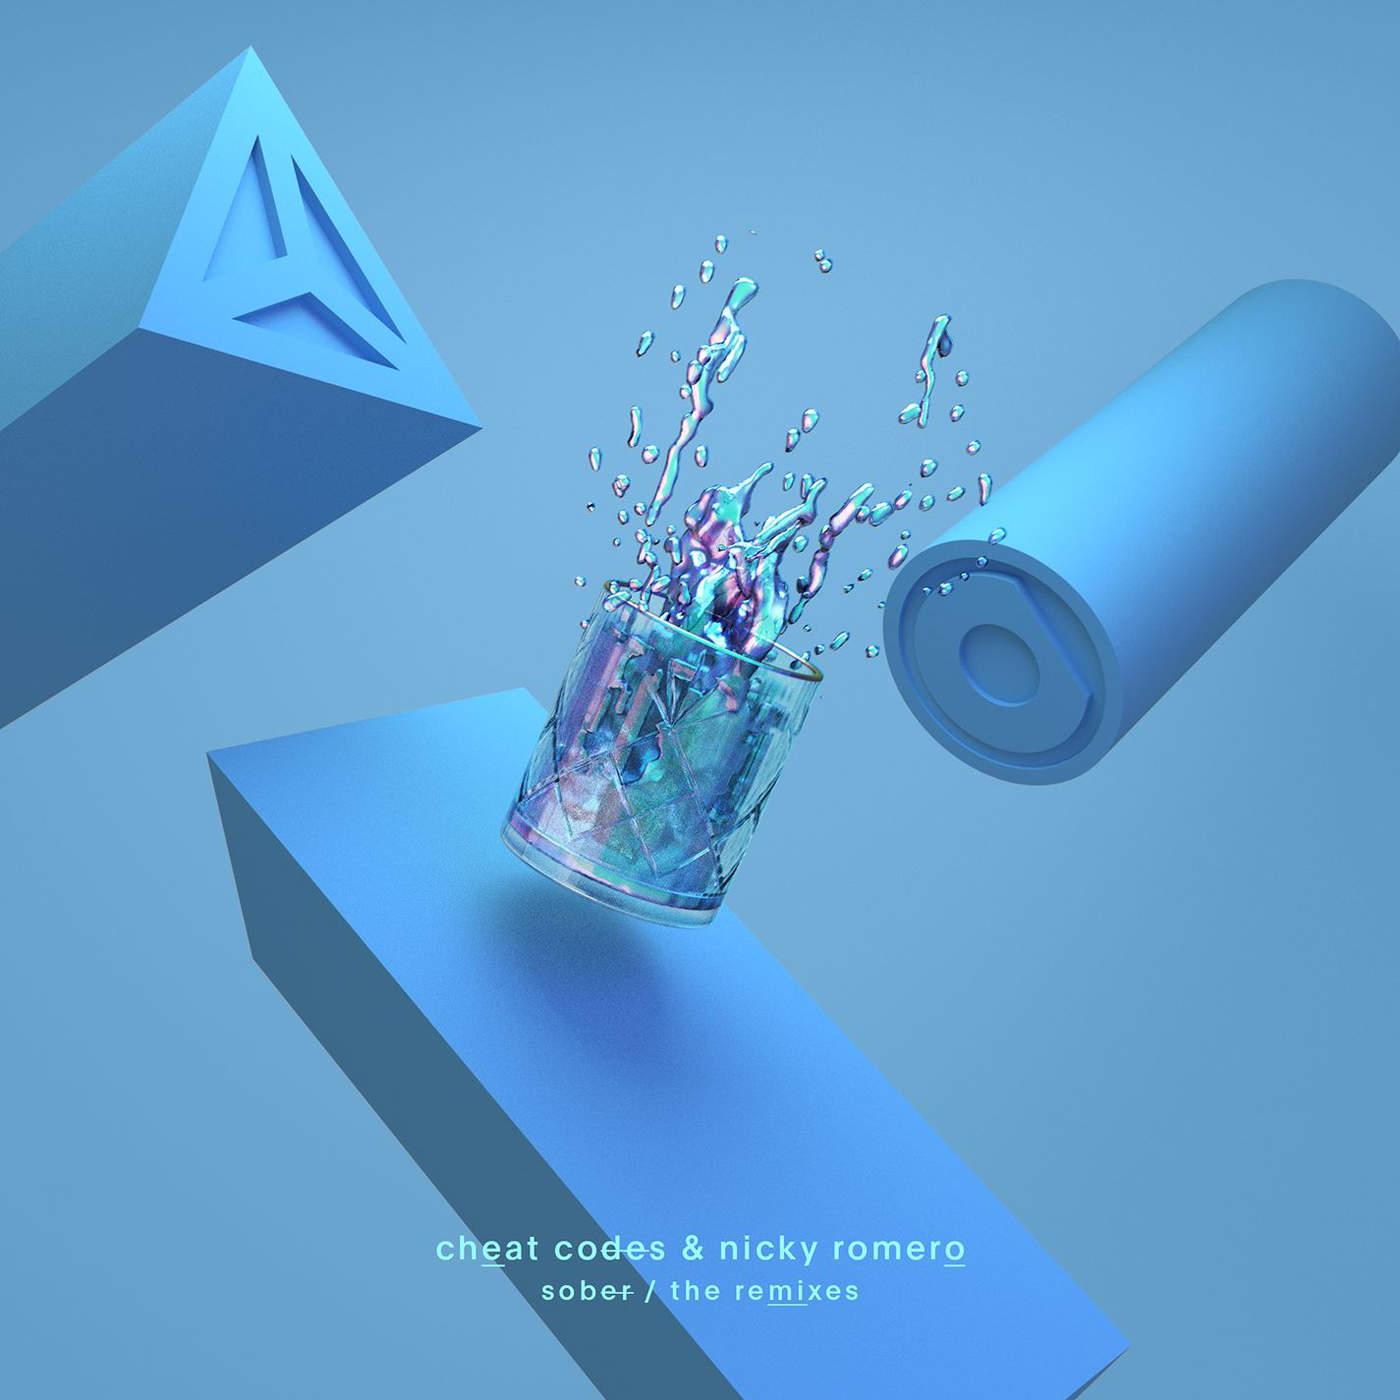 Sober (The Remixes) - Cheat Codes - Nicky Romero